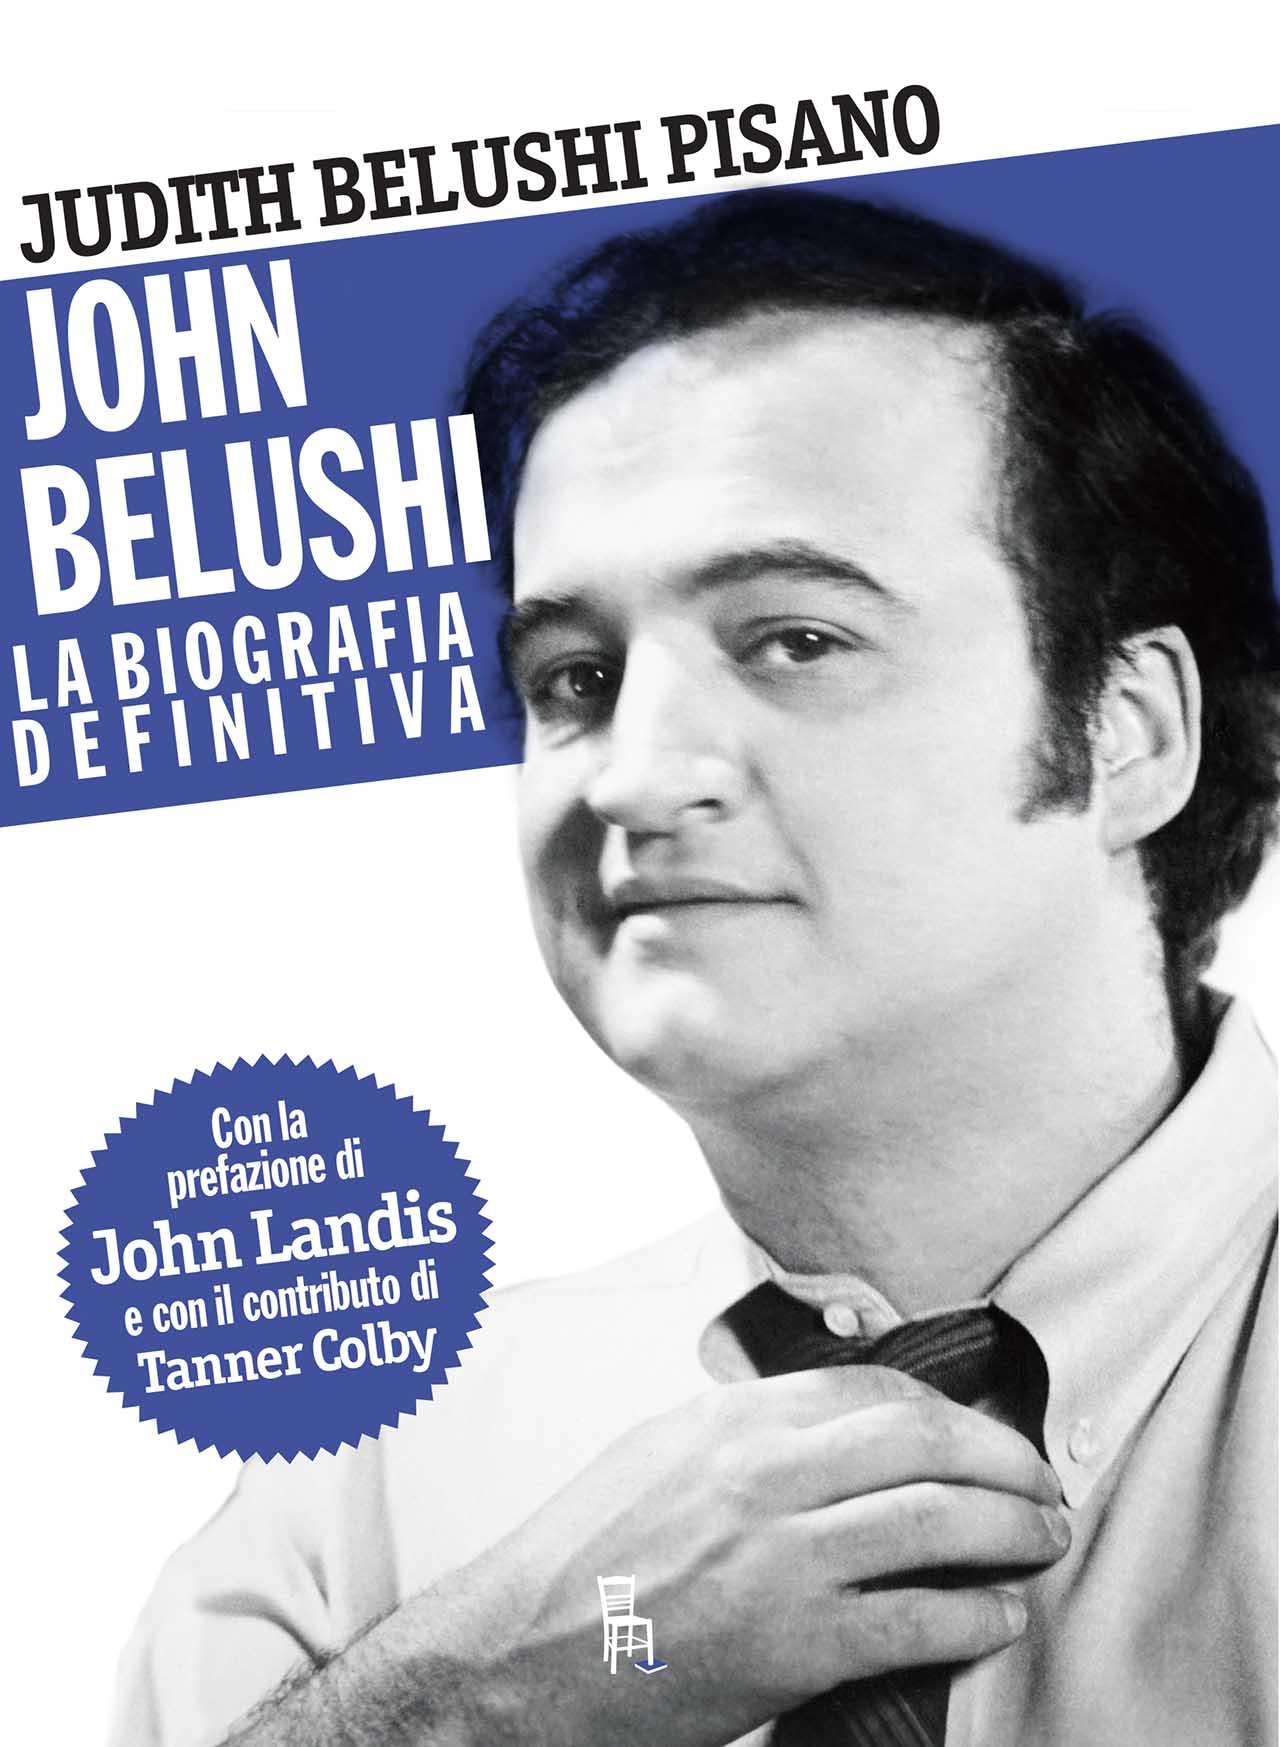 john belushi biografia comico storia